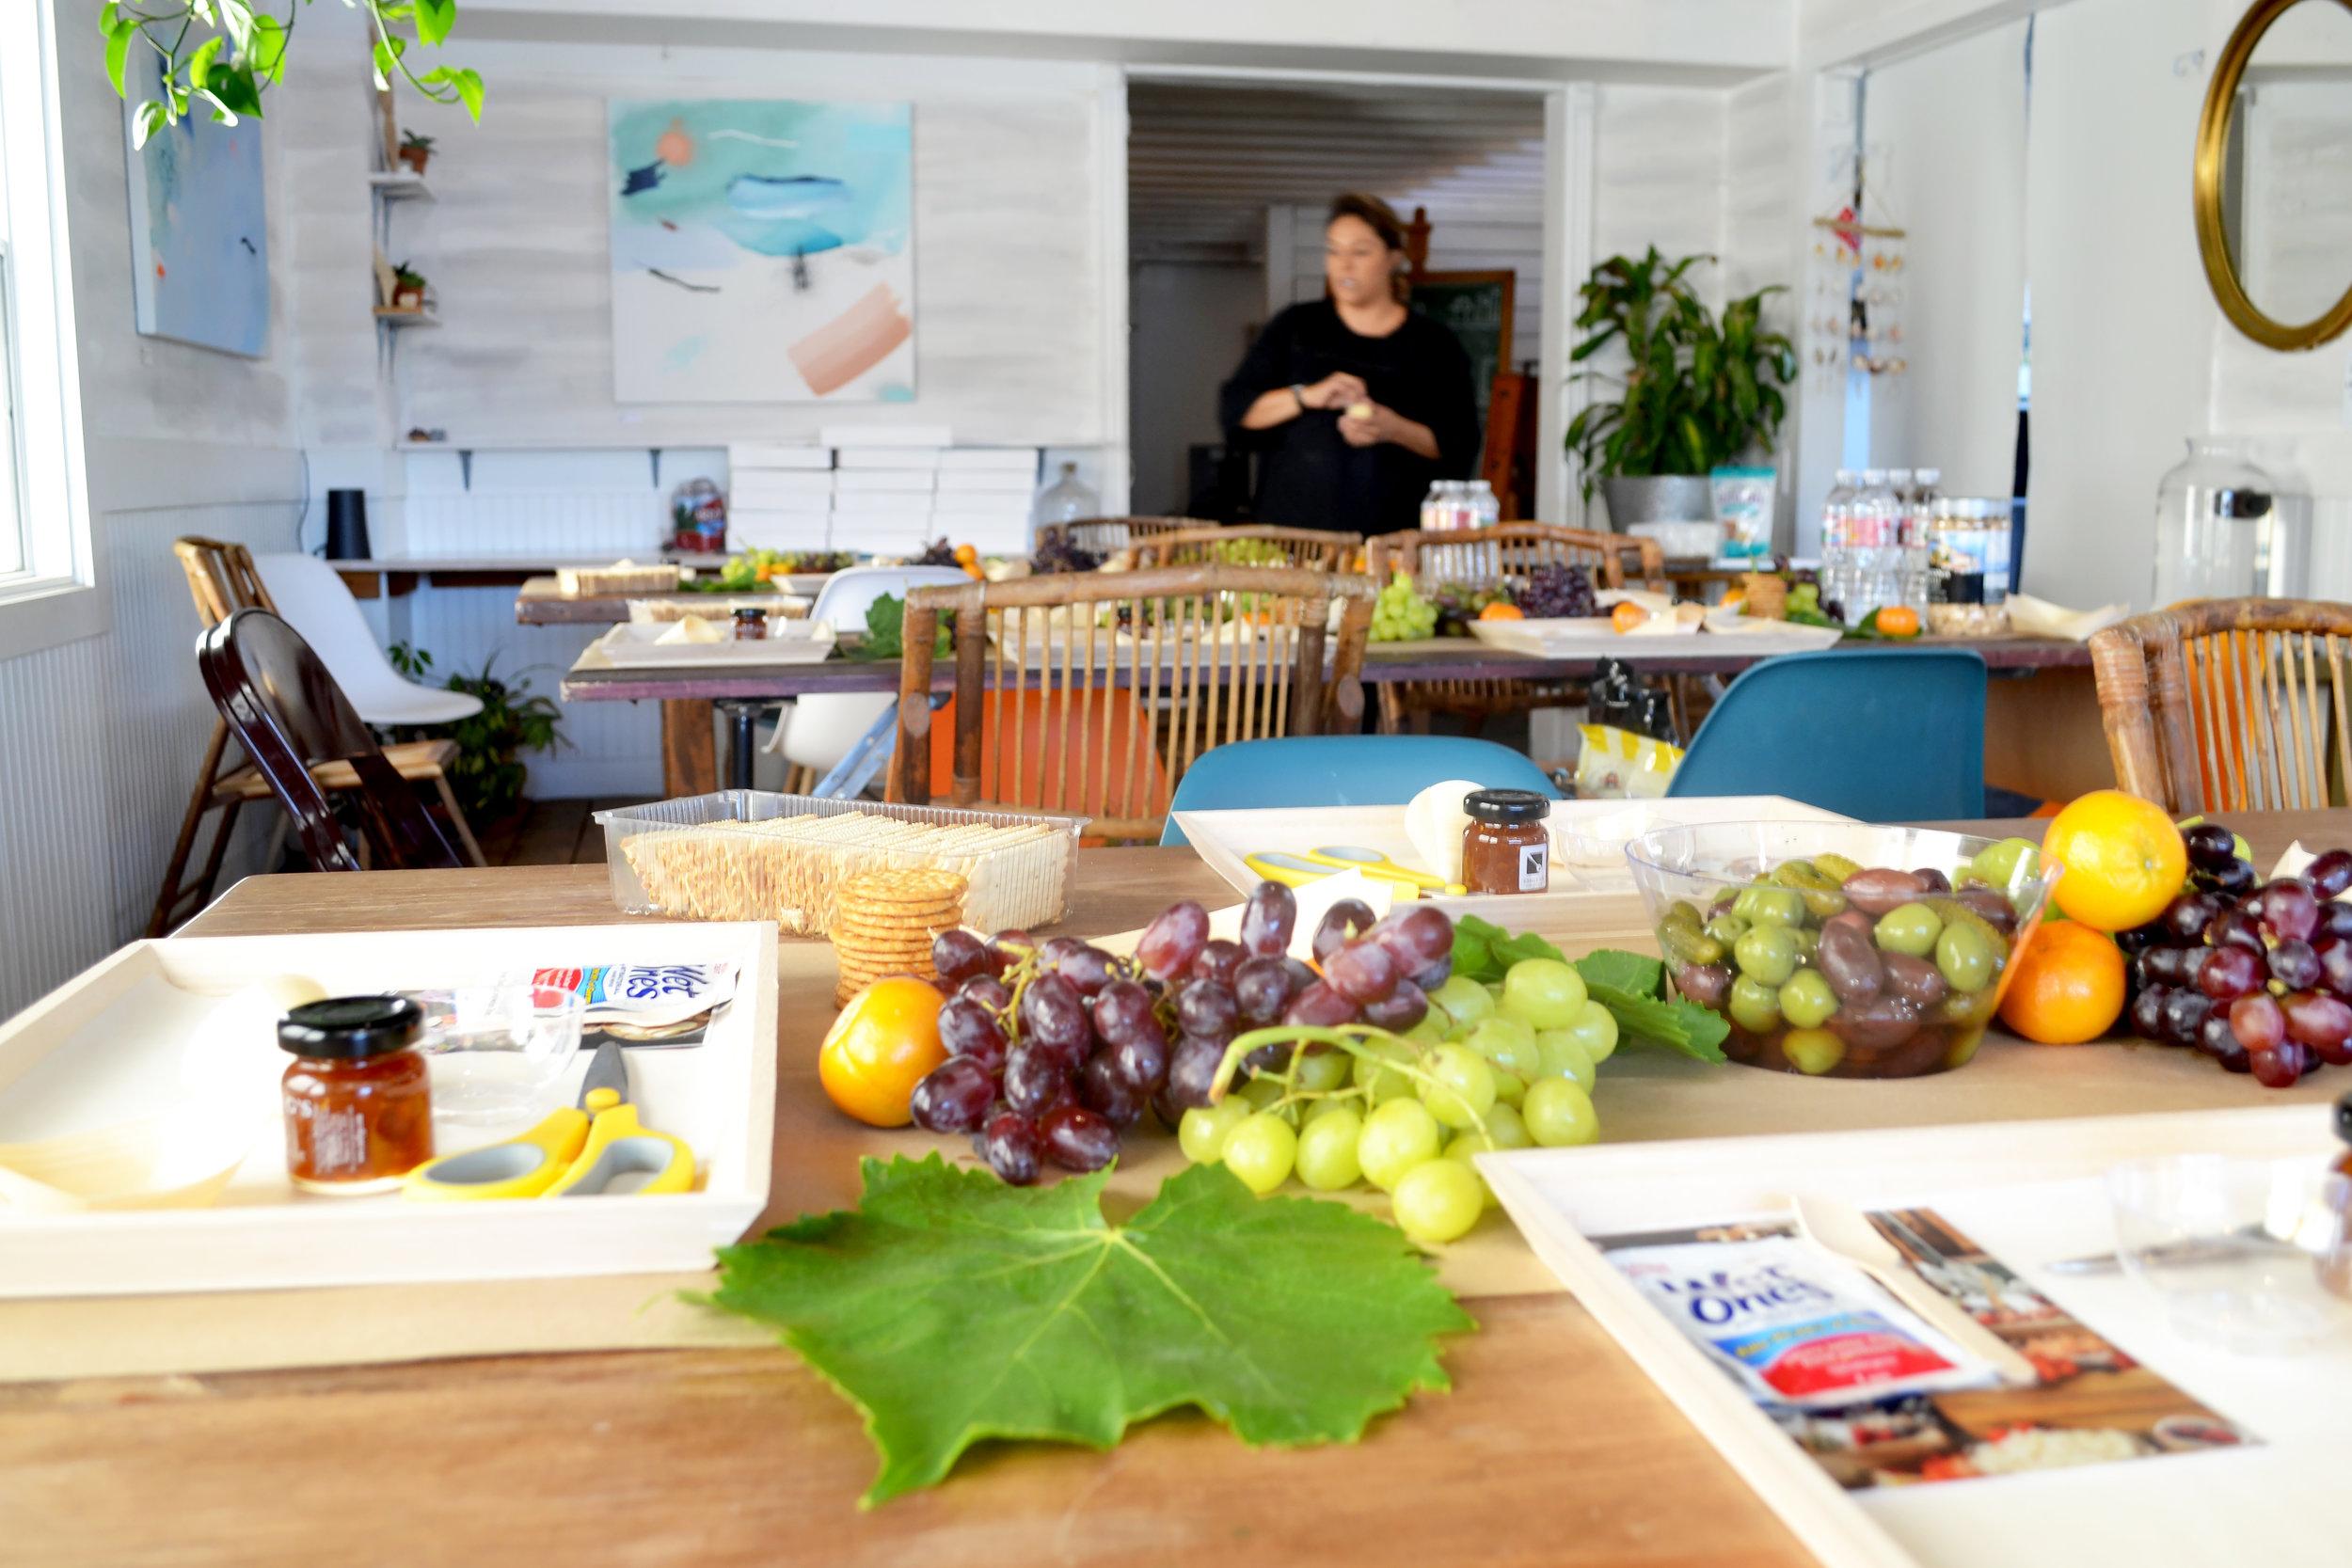 Noel Moton cheese workshop sourced laguna beach